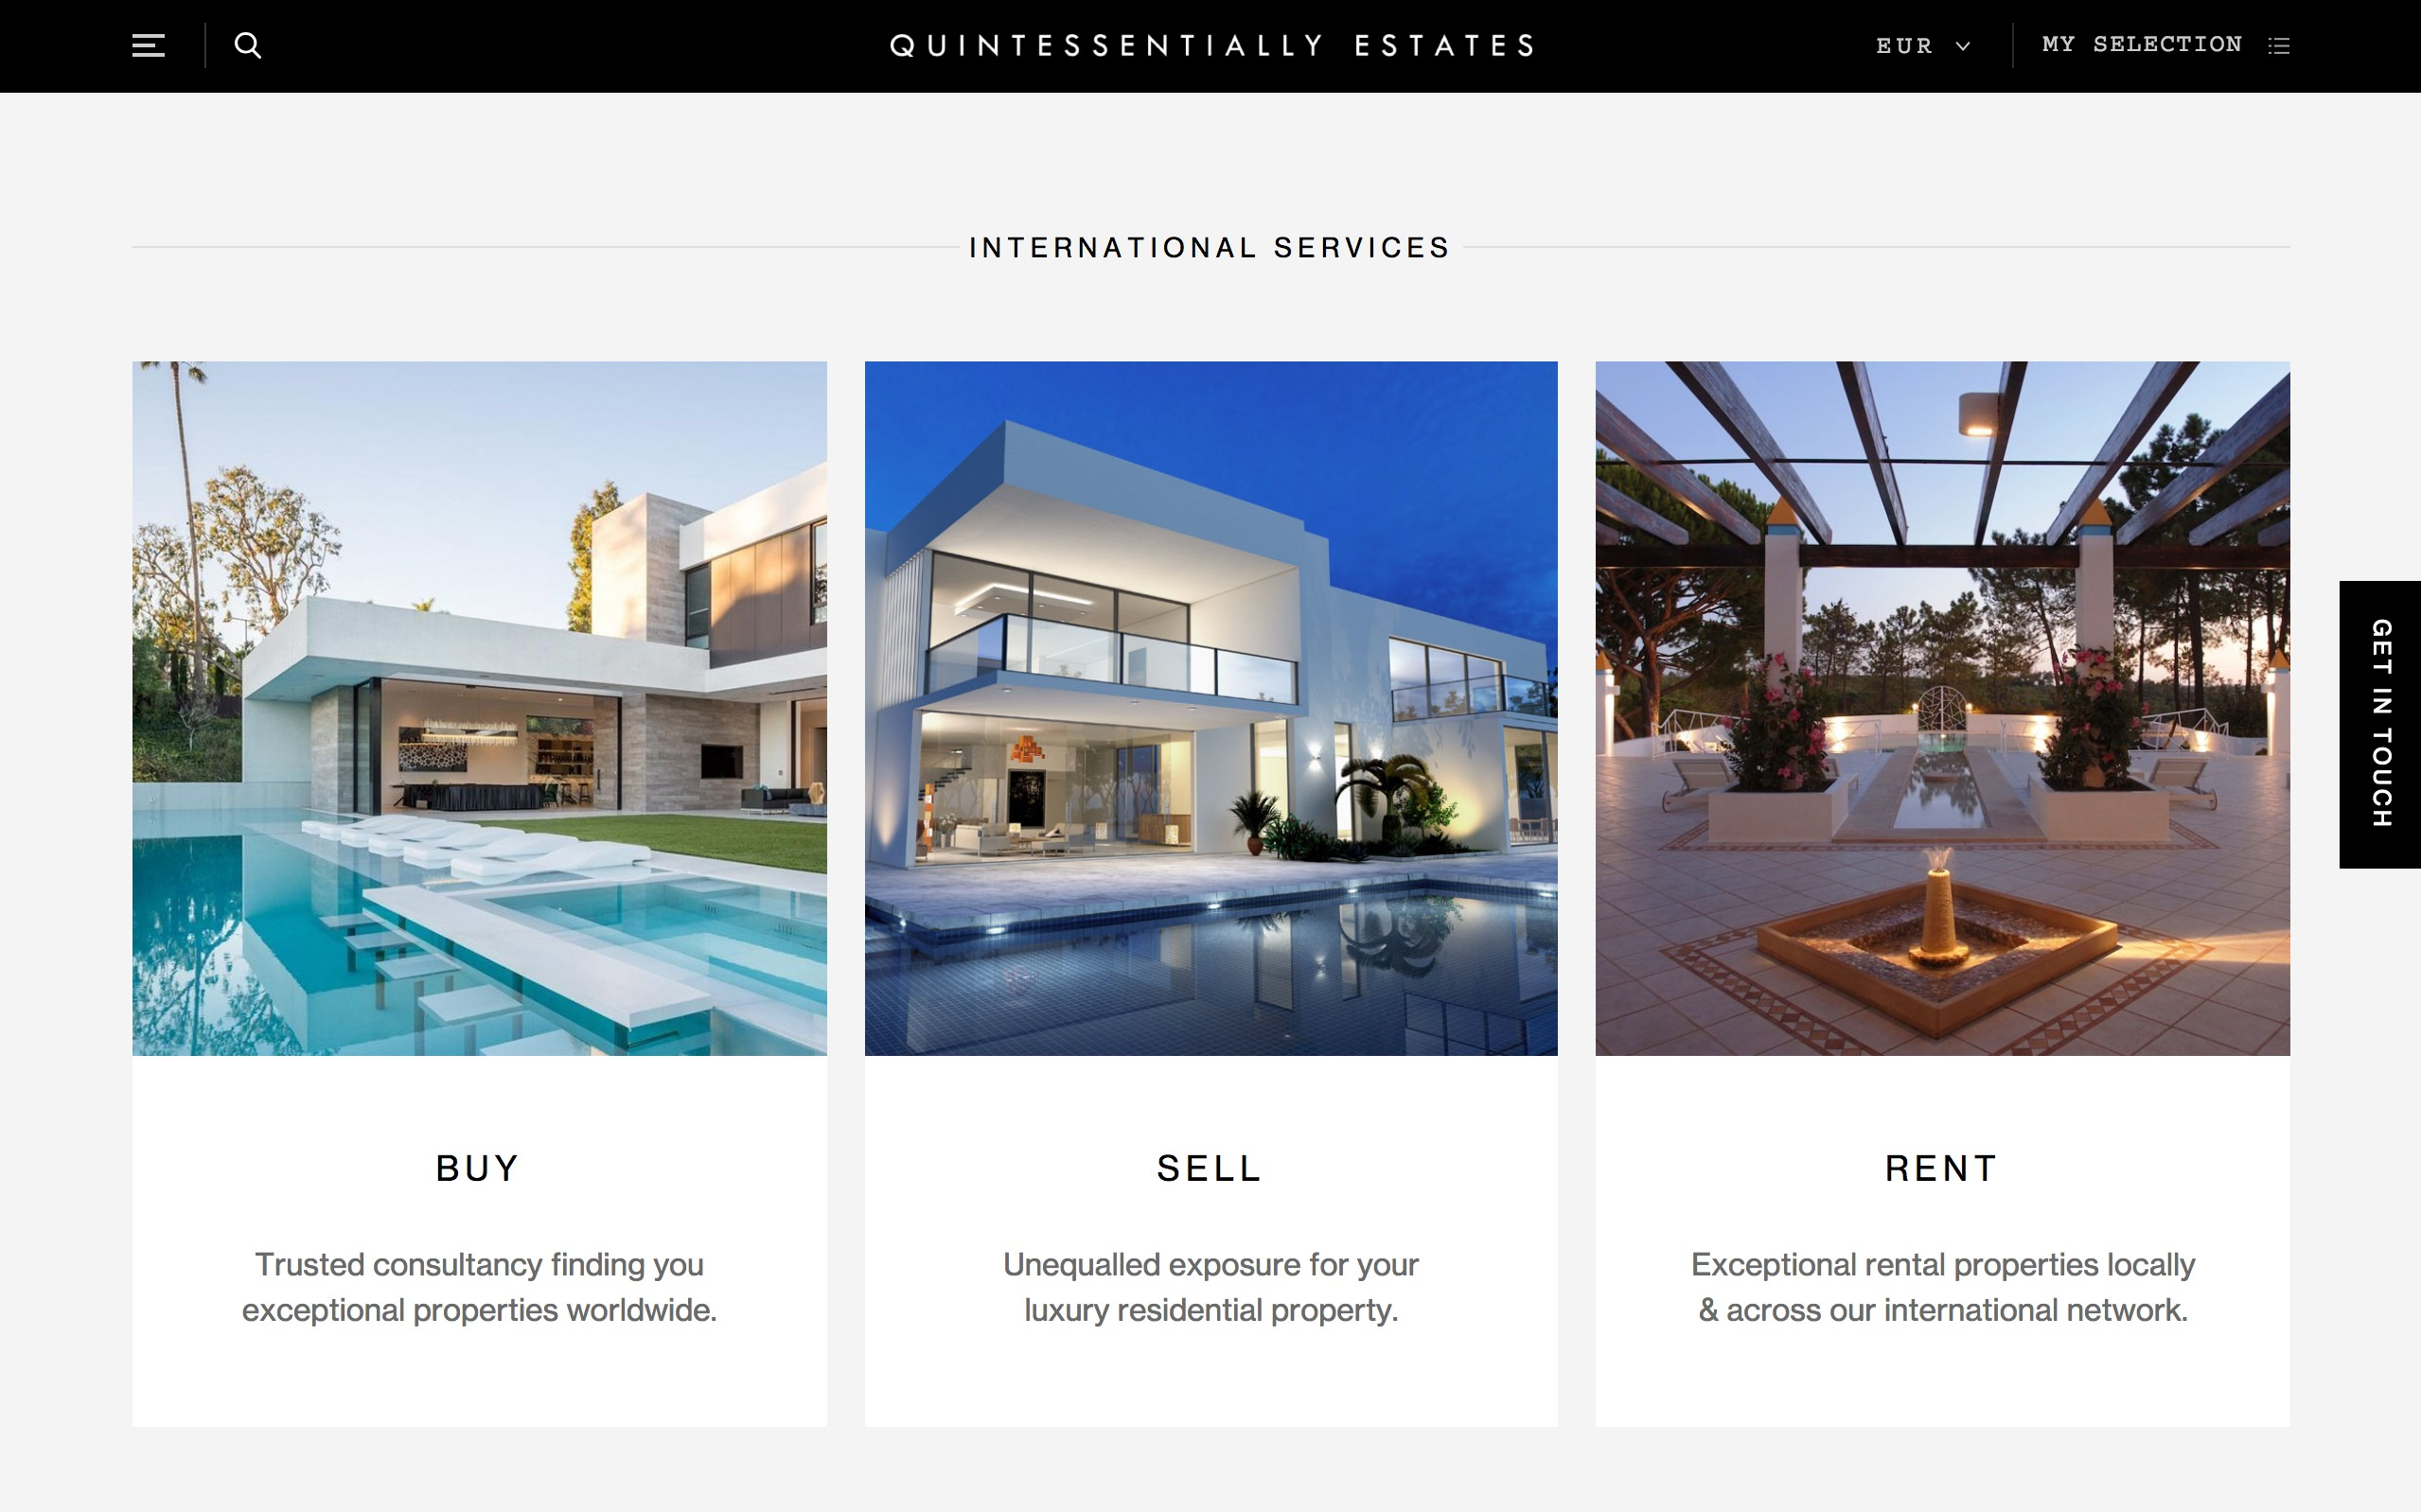 best architecture firm websites. quintessentially estates